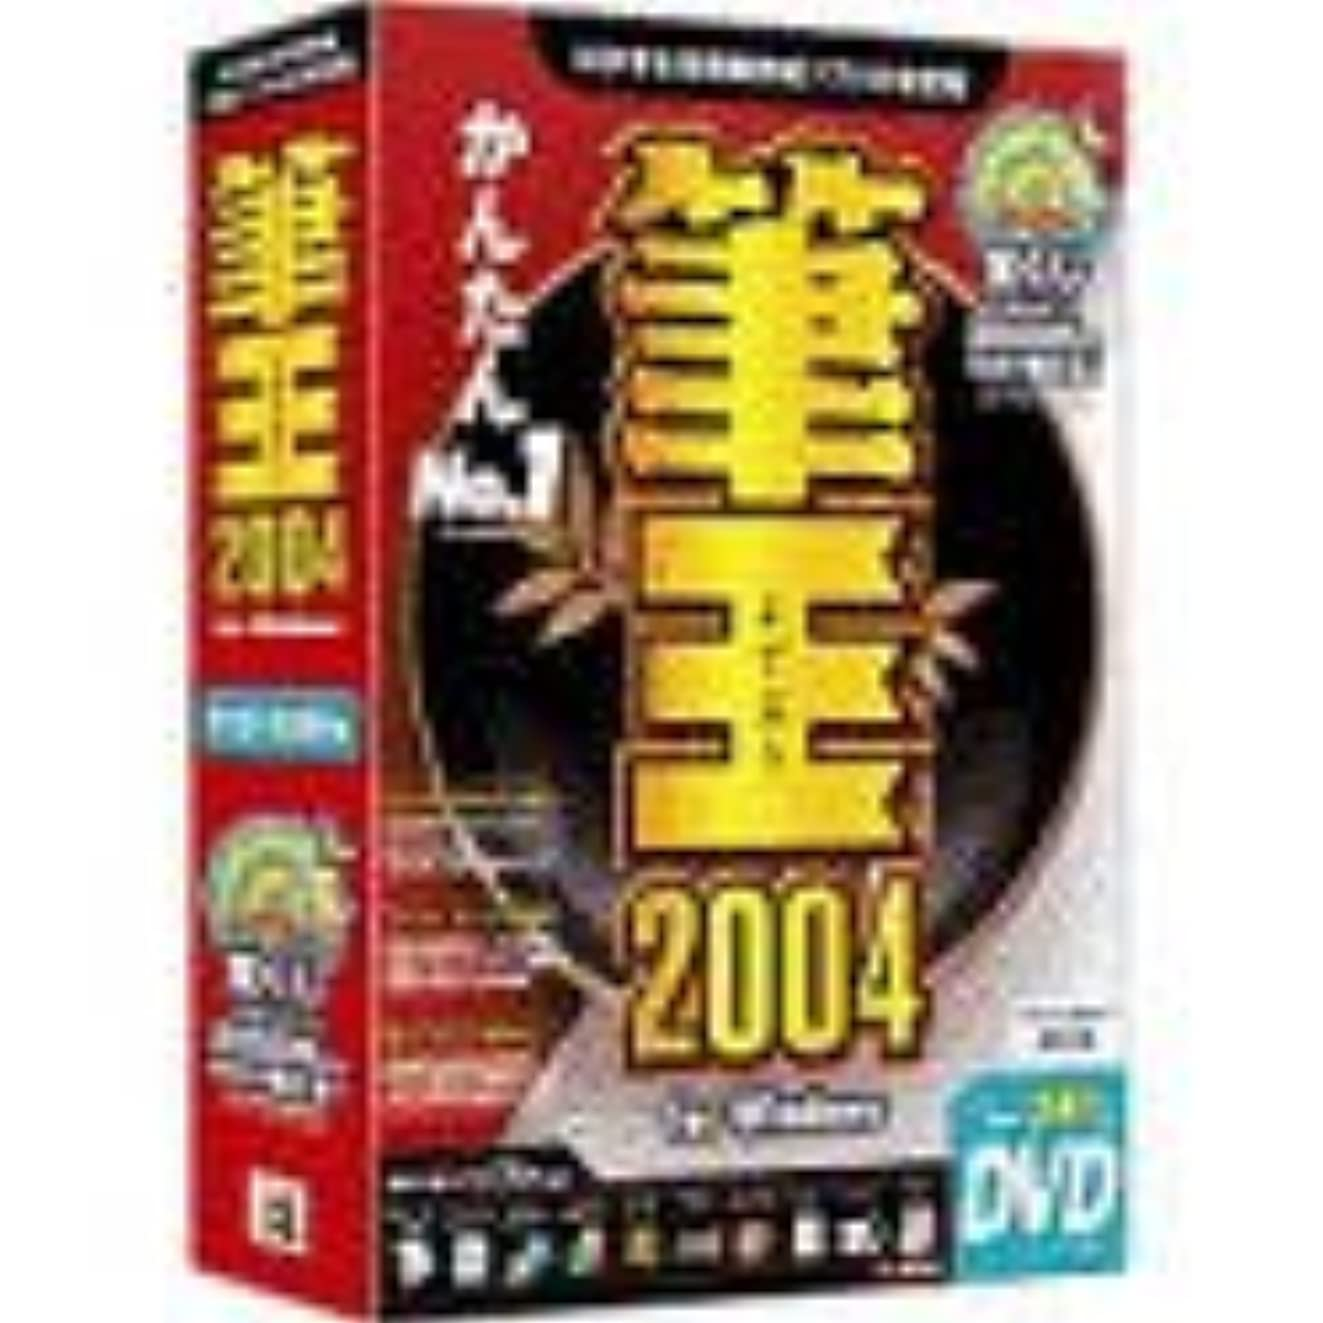 悪性の砂漠微生物筆王 2004 for Windows DVD-ROM版